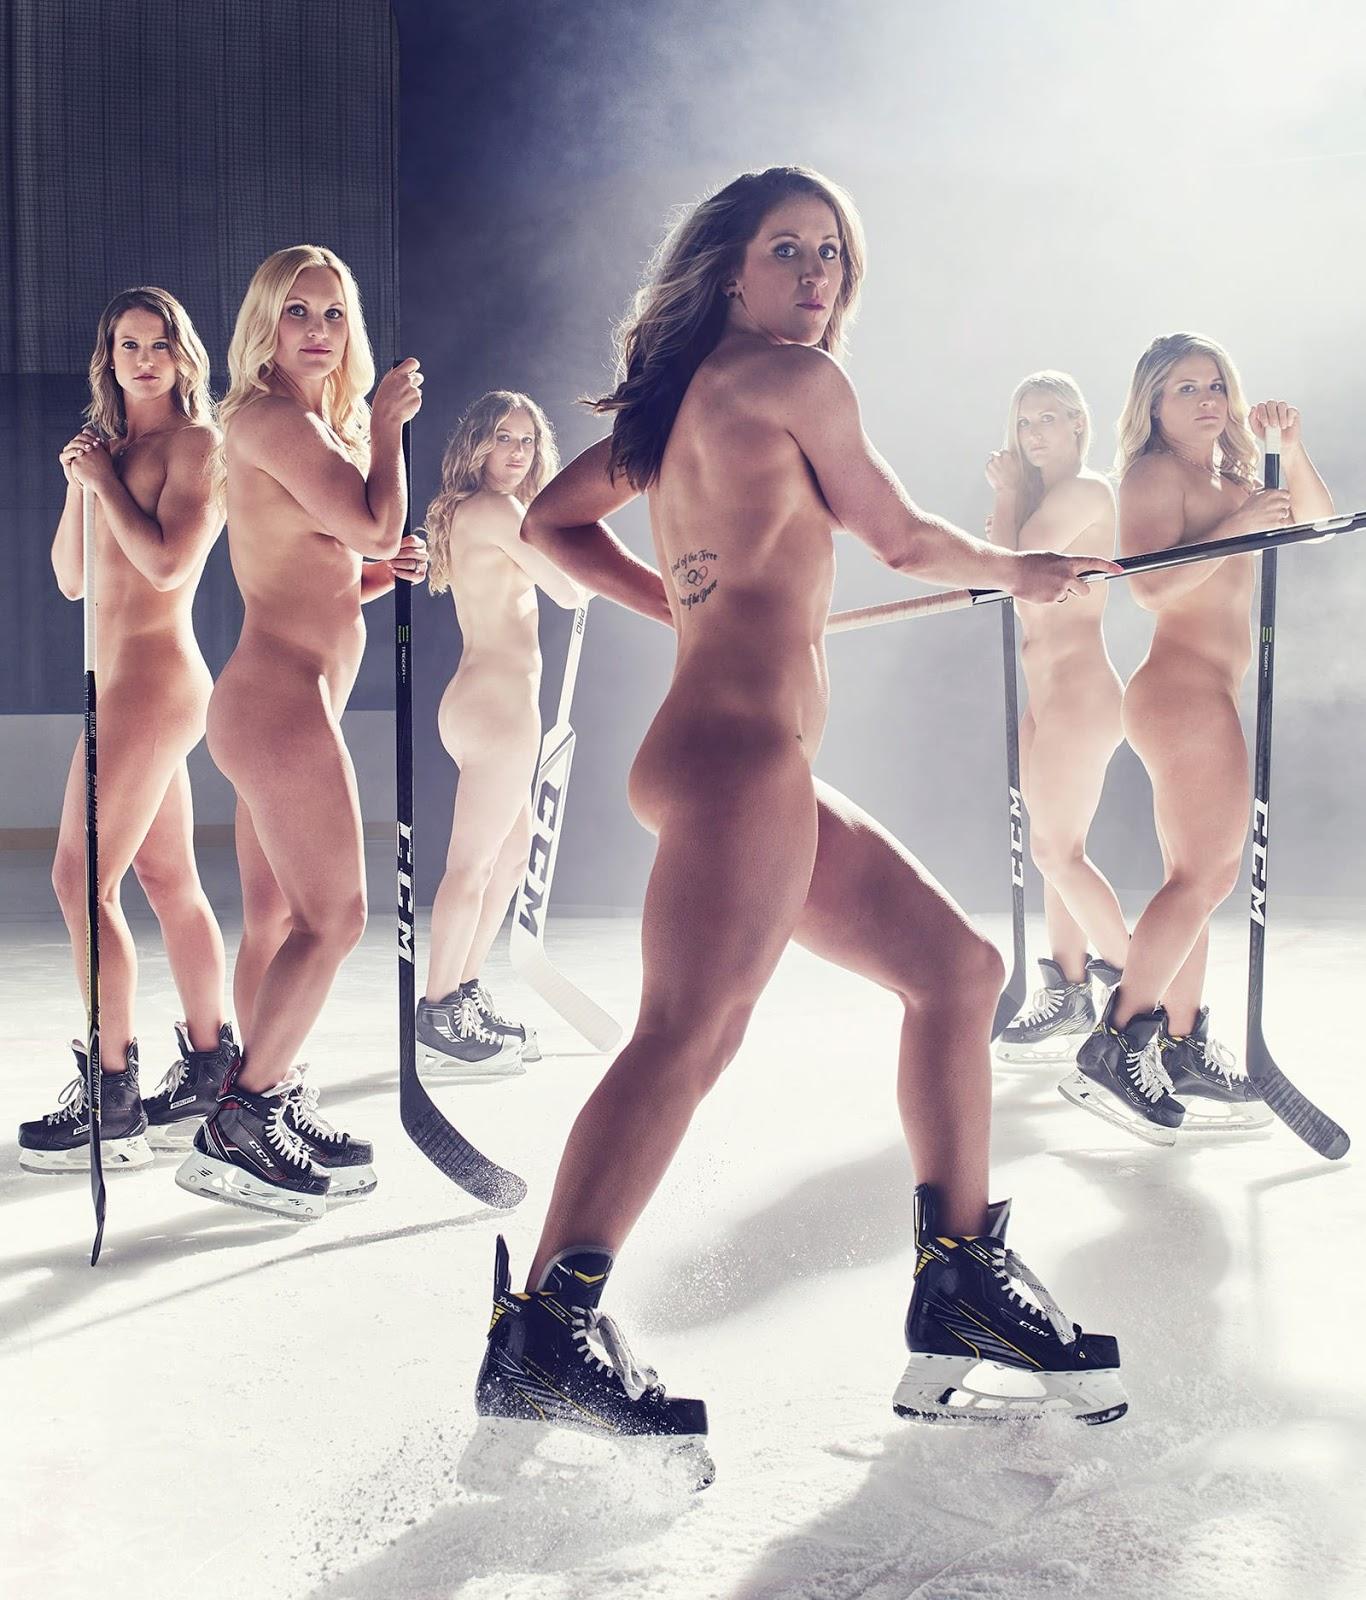 Tits sports women najed assporn bbw